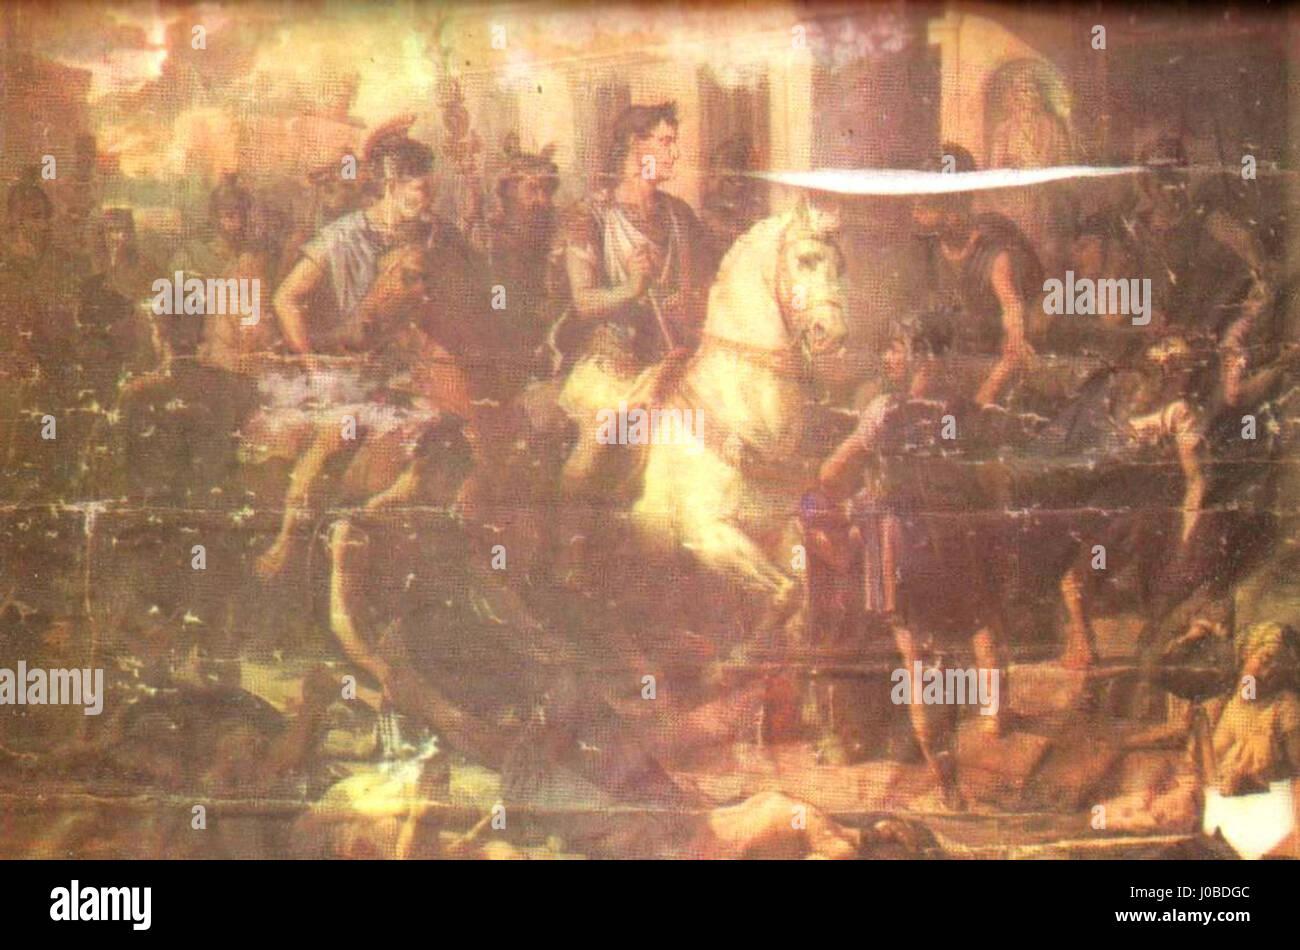 Hentia Pics regarding sava hentia stock photo, royalty free image: 137935068 - alamy